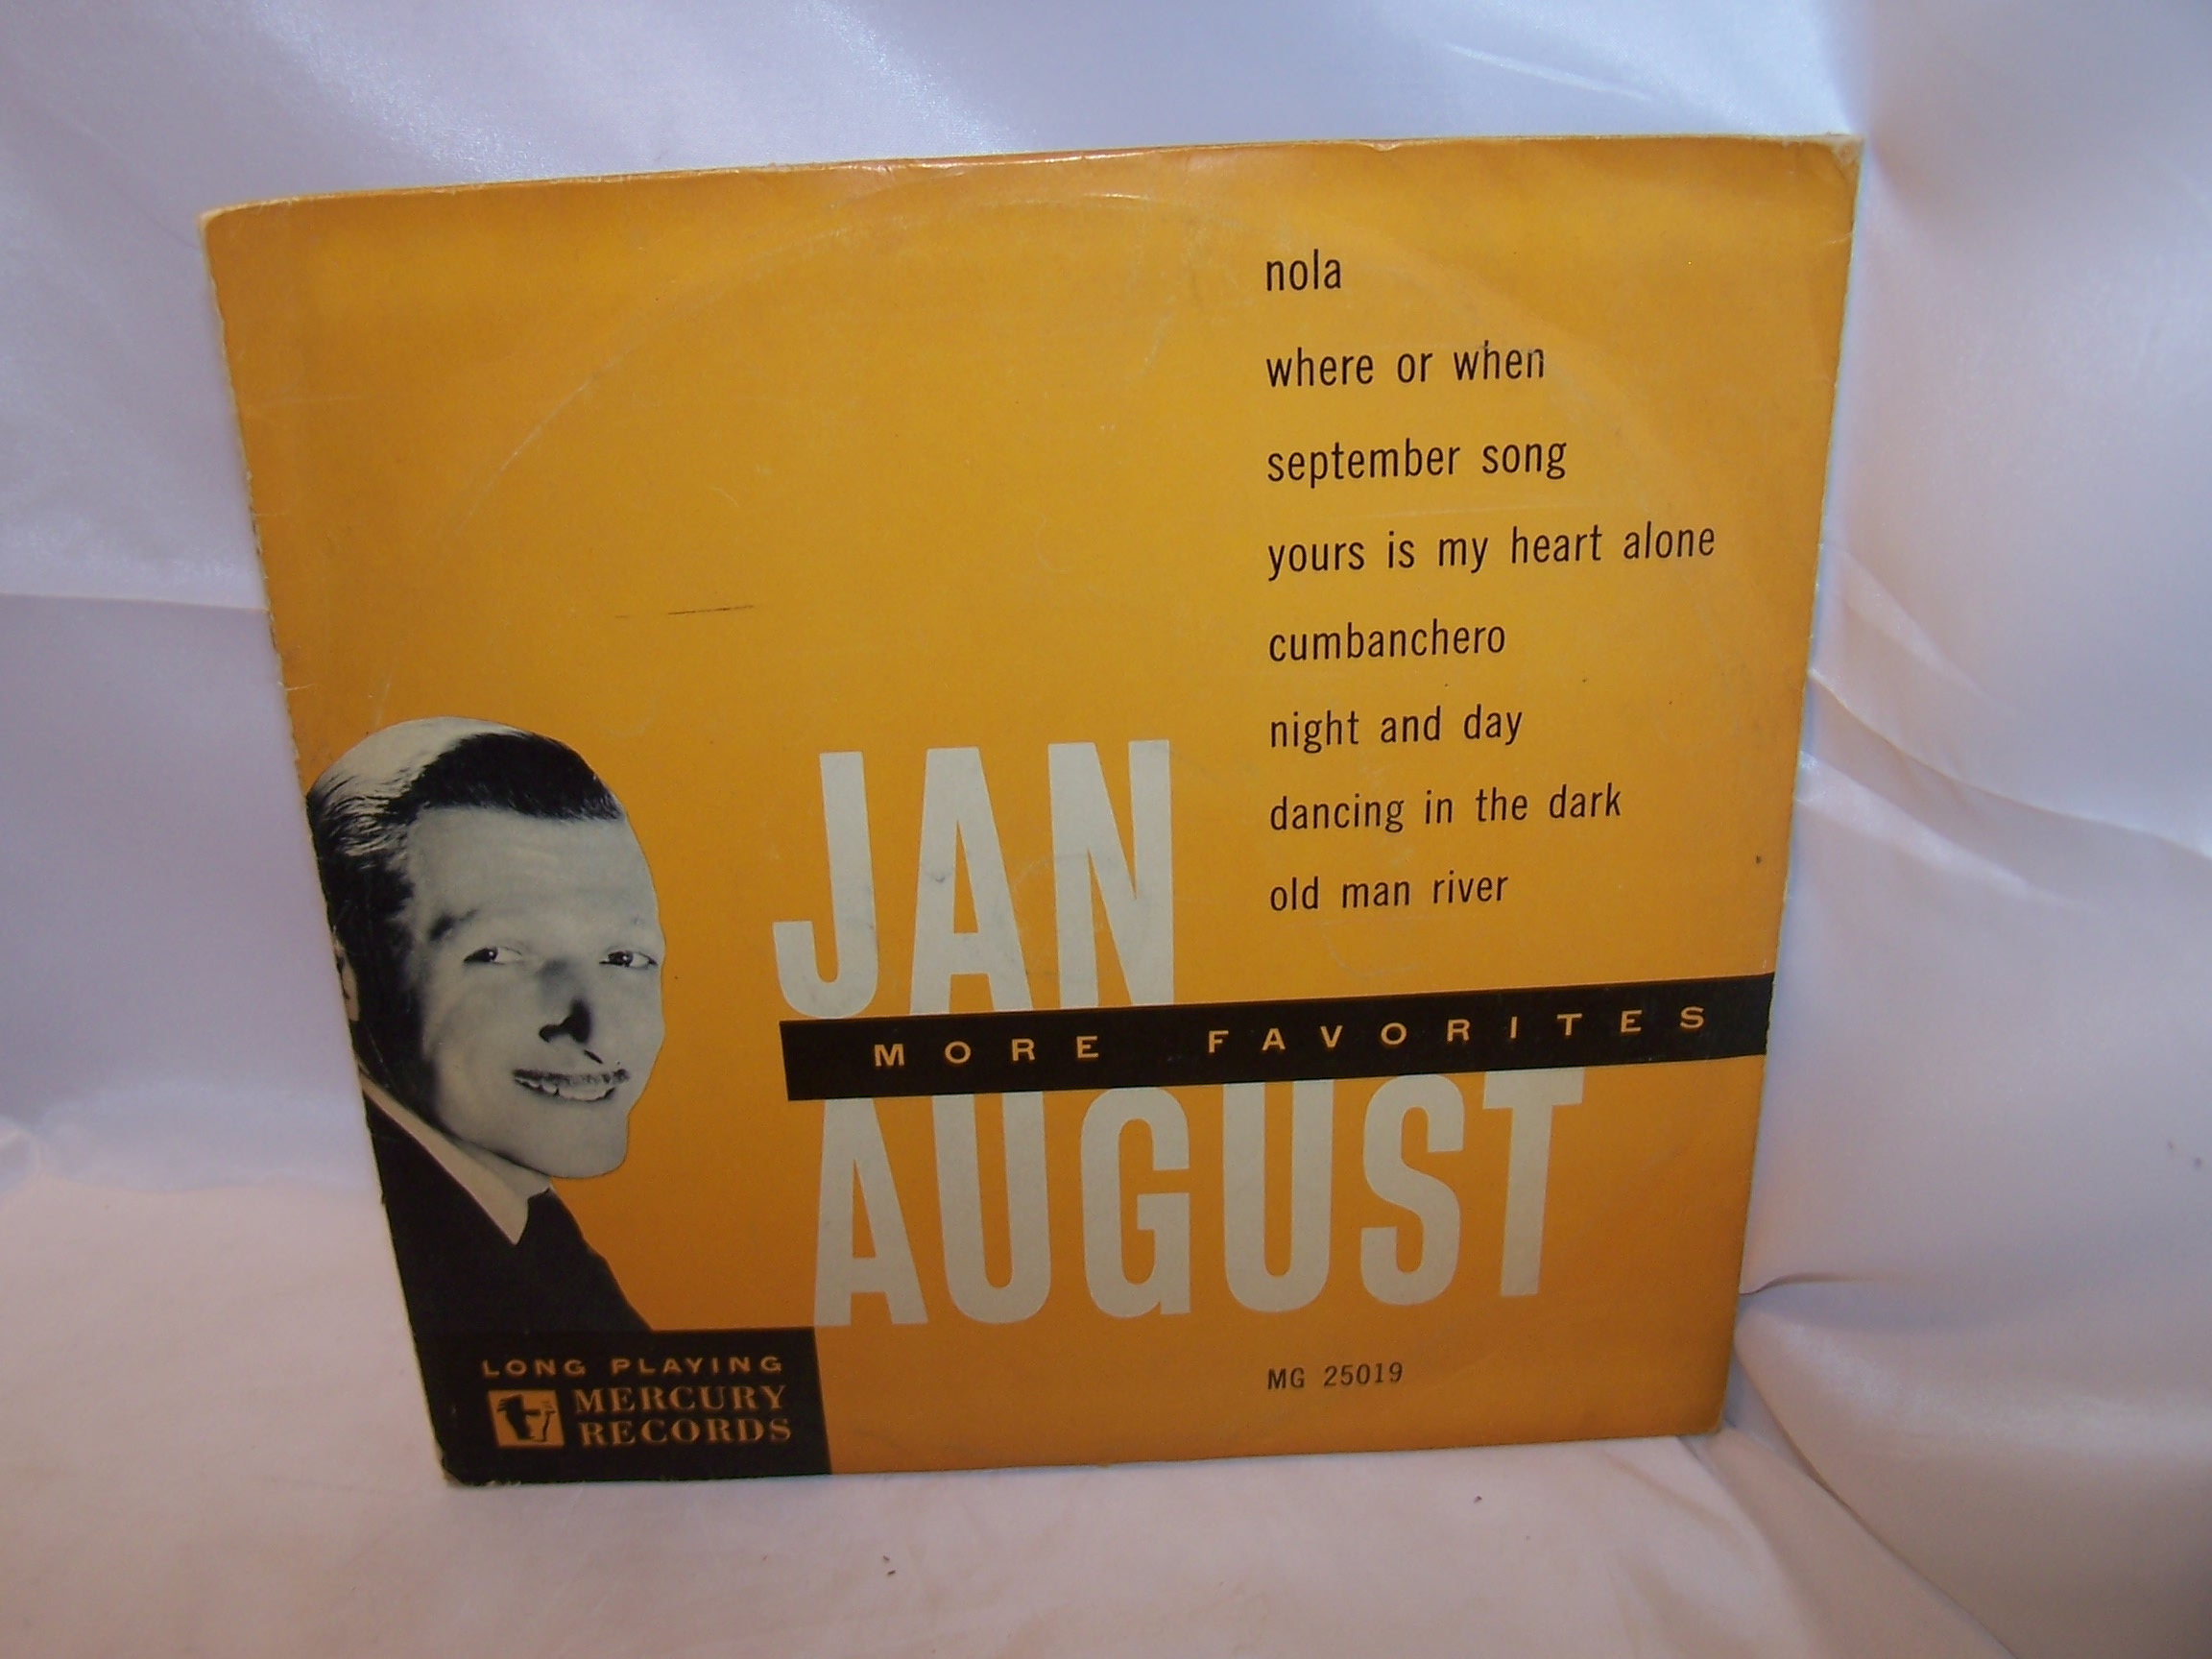 Jan August Vintage Record